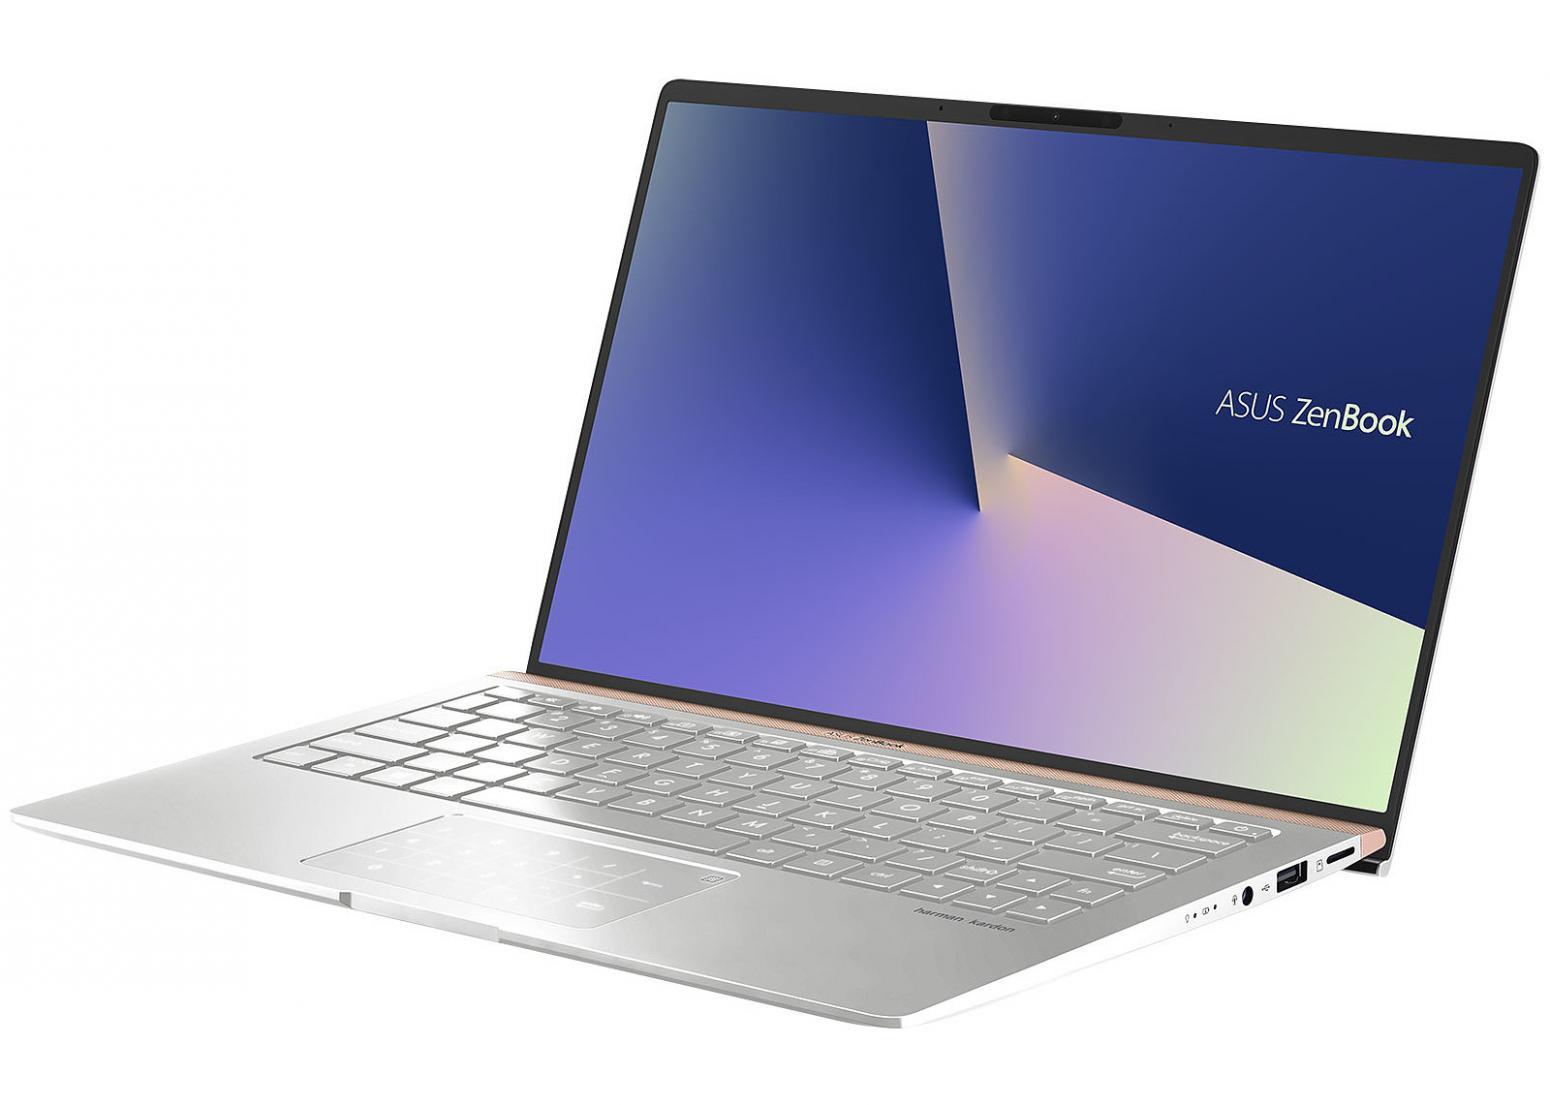 Ordinateur portable Asus Zenbook 13 UX333FA-A3238R Argent - NumPad, Pro - photo 2